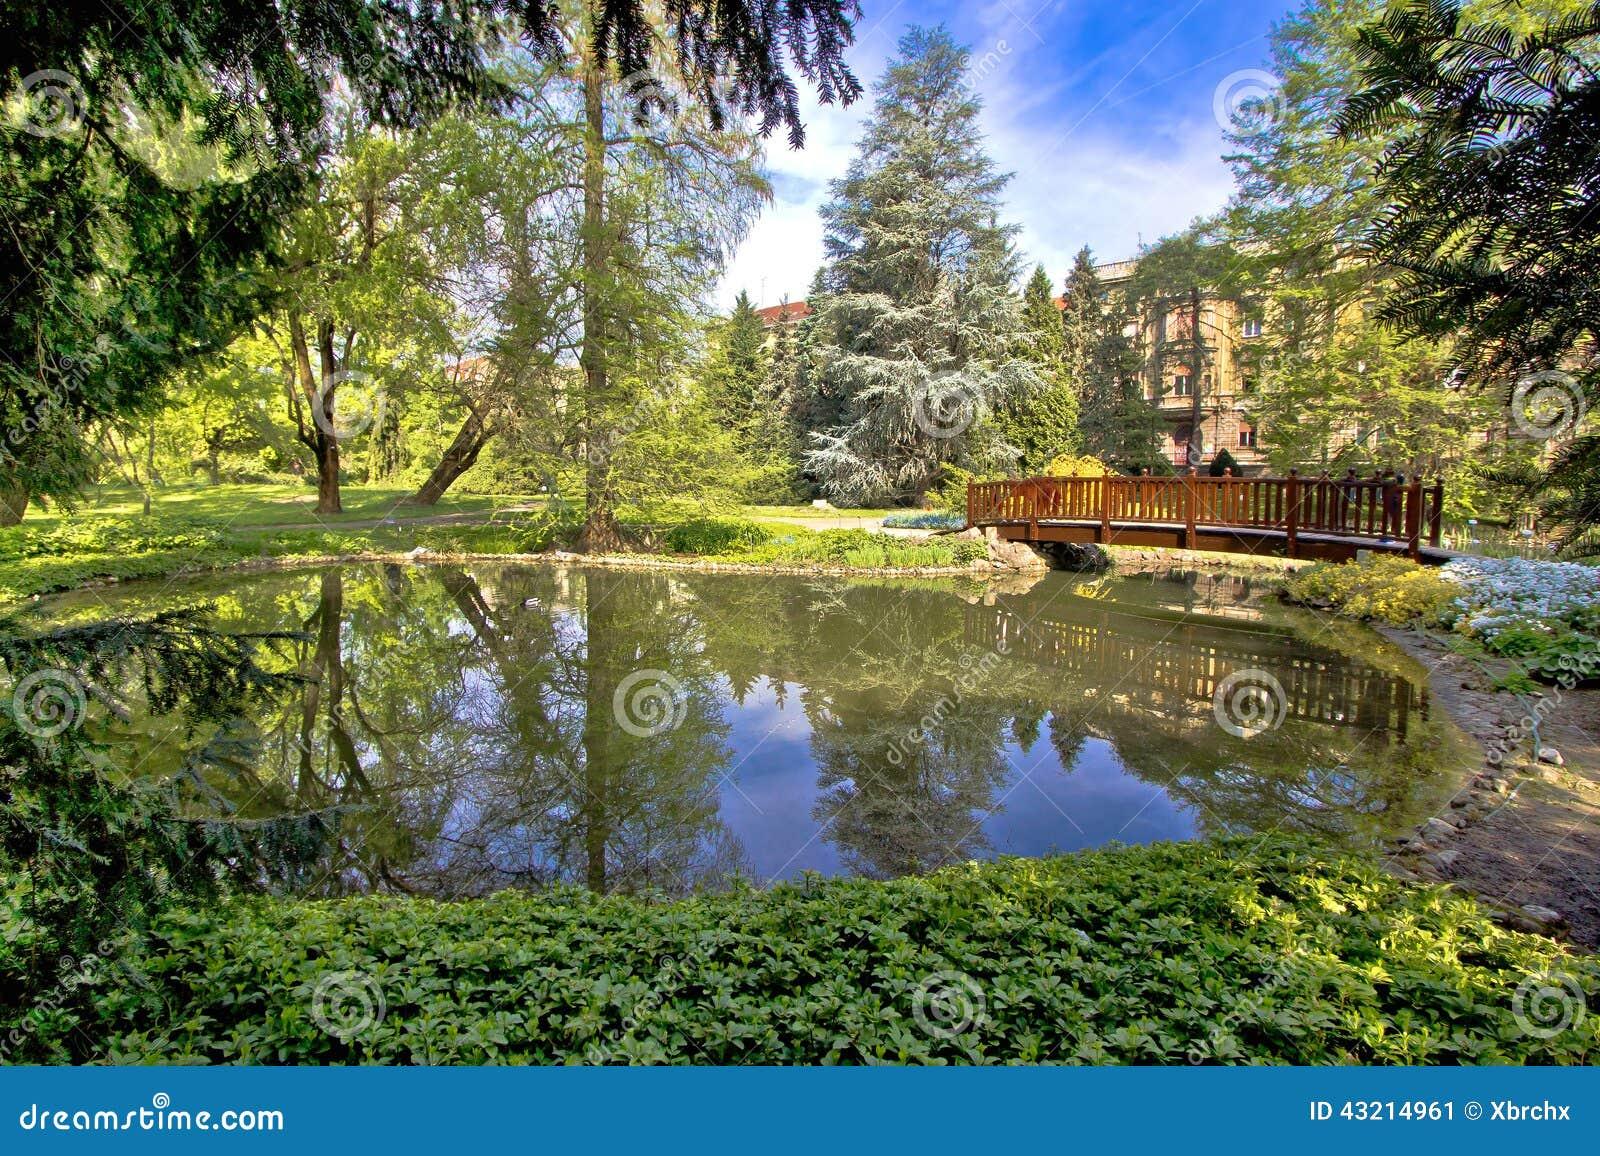 Oasi botanica di città giardino di Zagabria